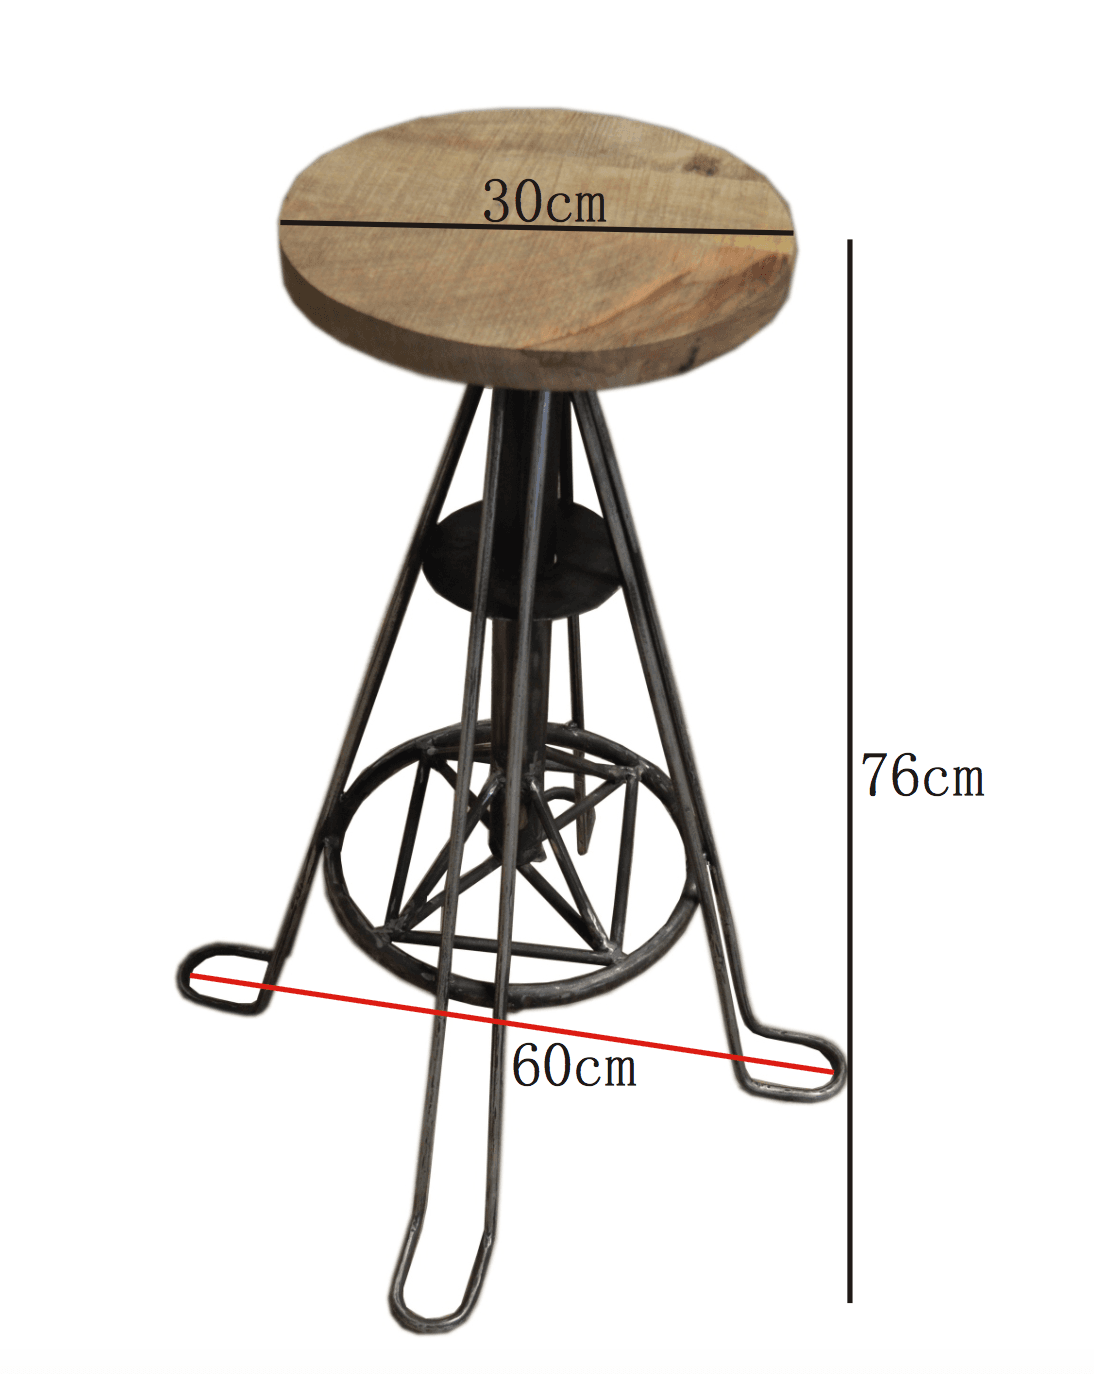 industrial furniture wooden and metal industrial stool. Black Bedroom Furniture Sets. Home Design Ideas